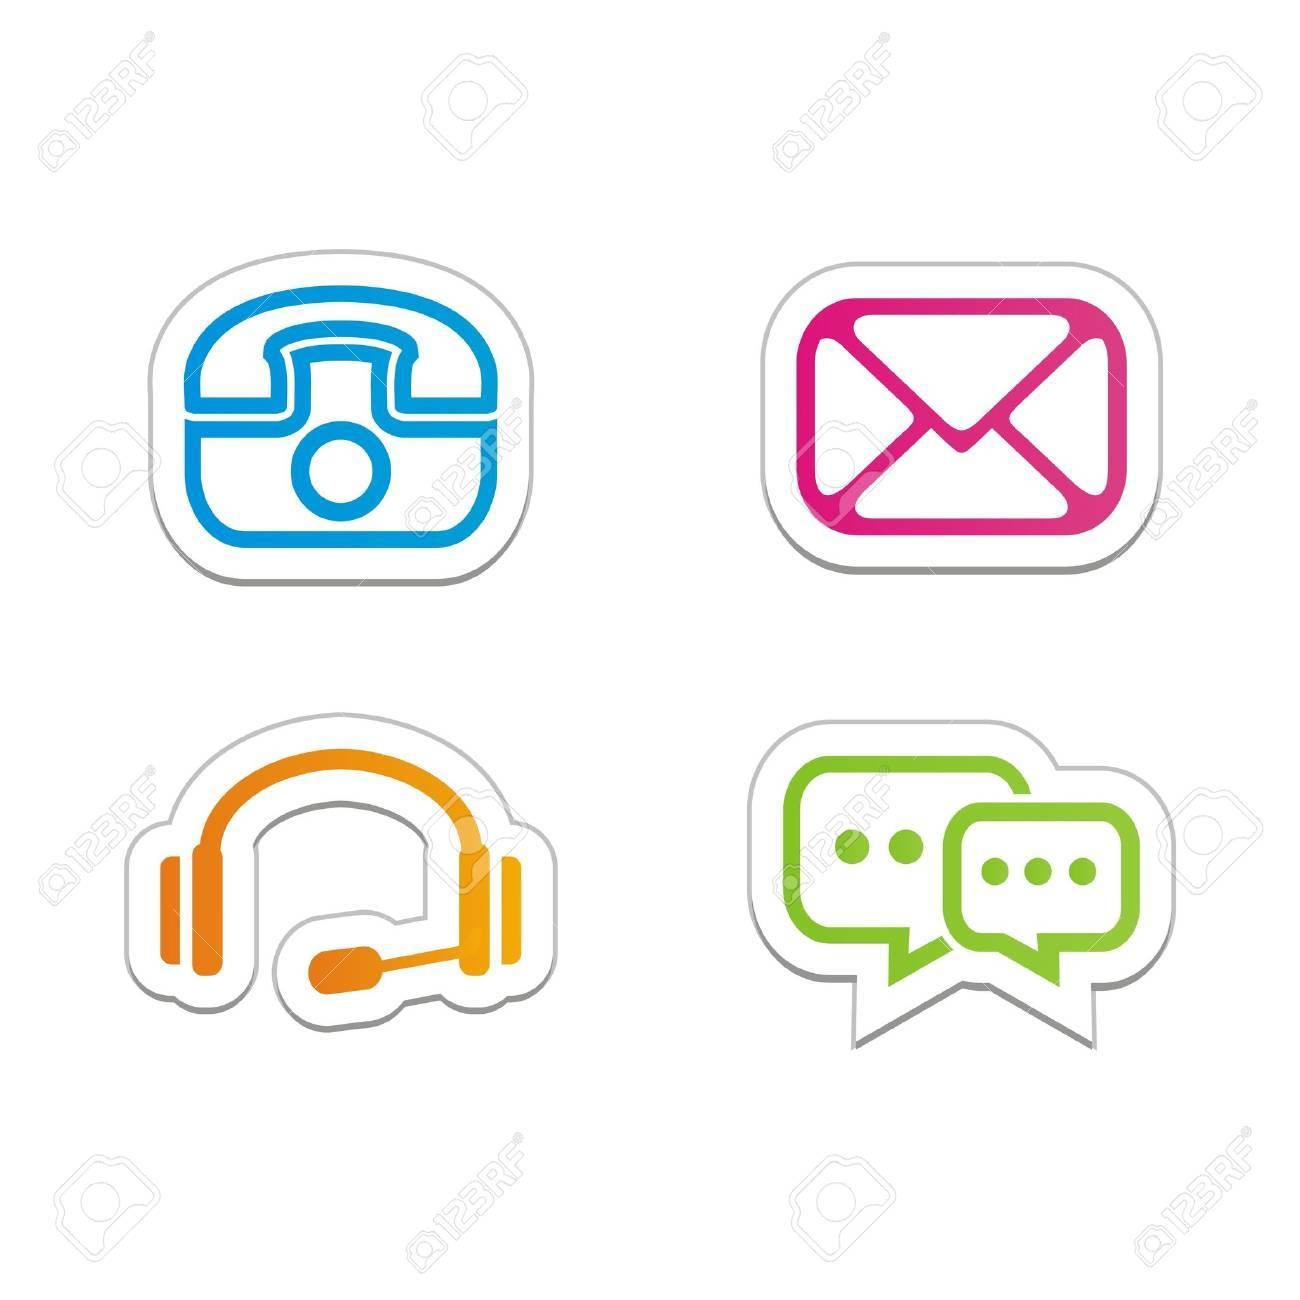 Contact symbols stickers stock vector 21877297